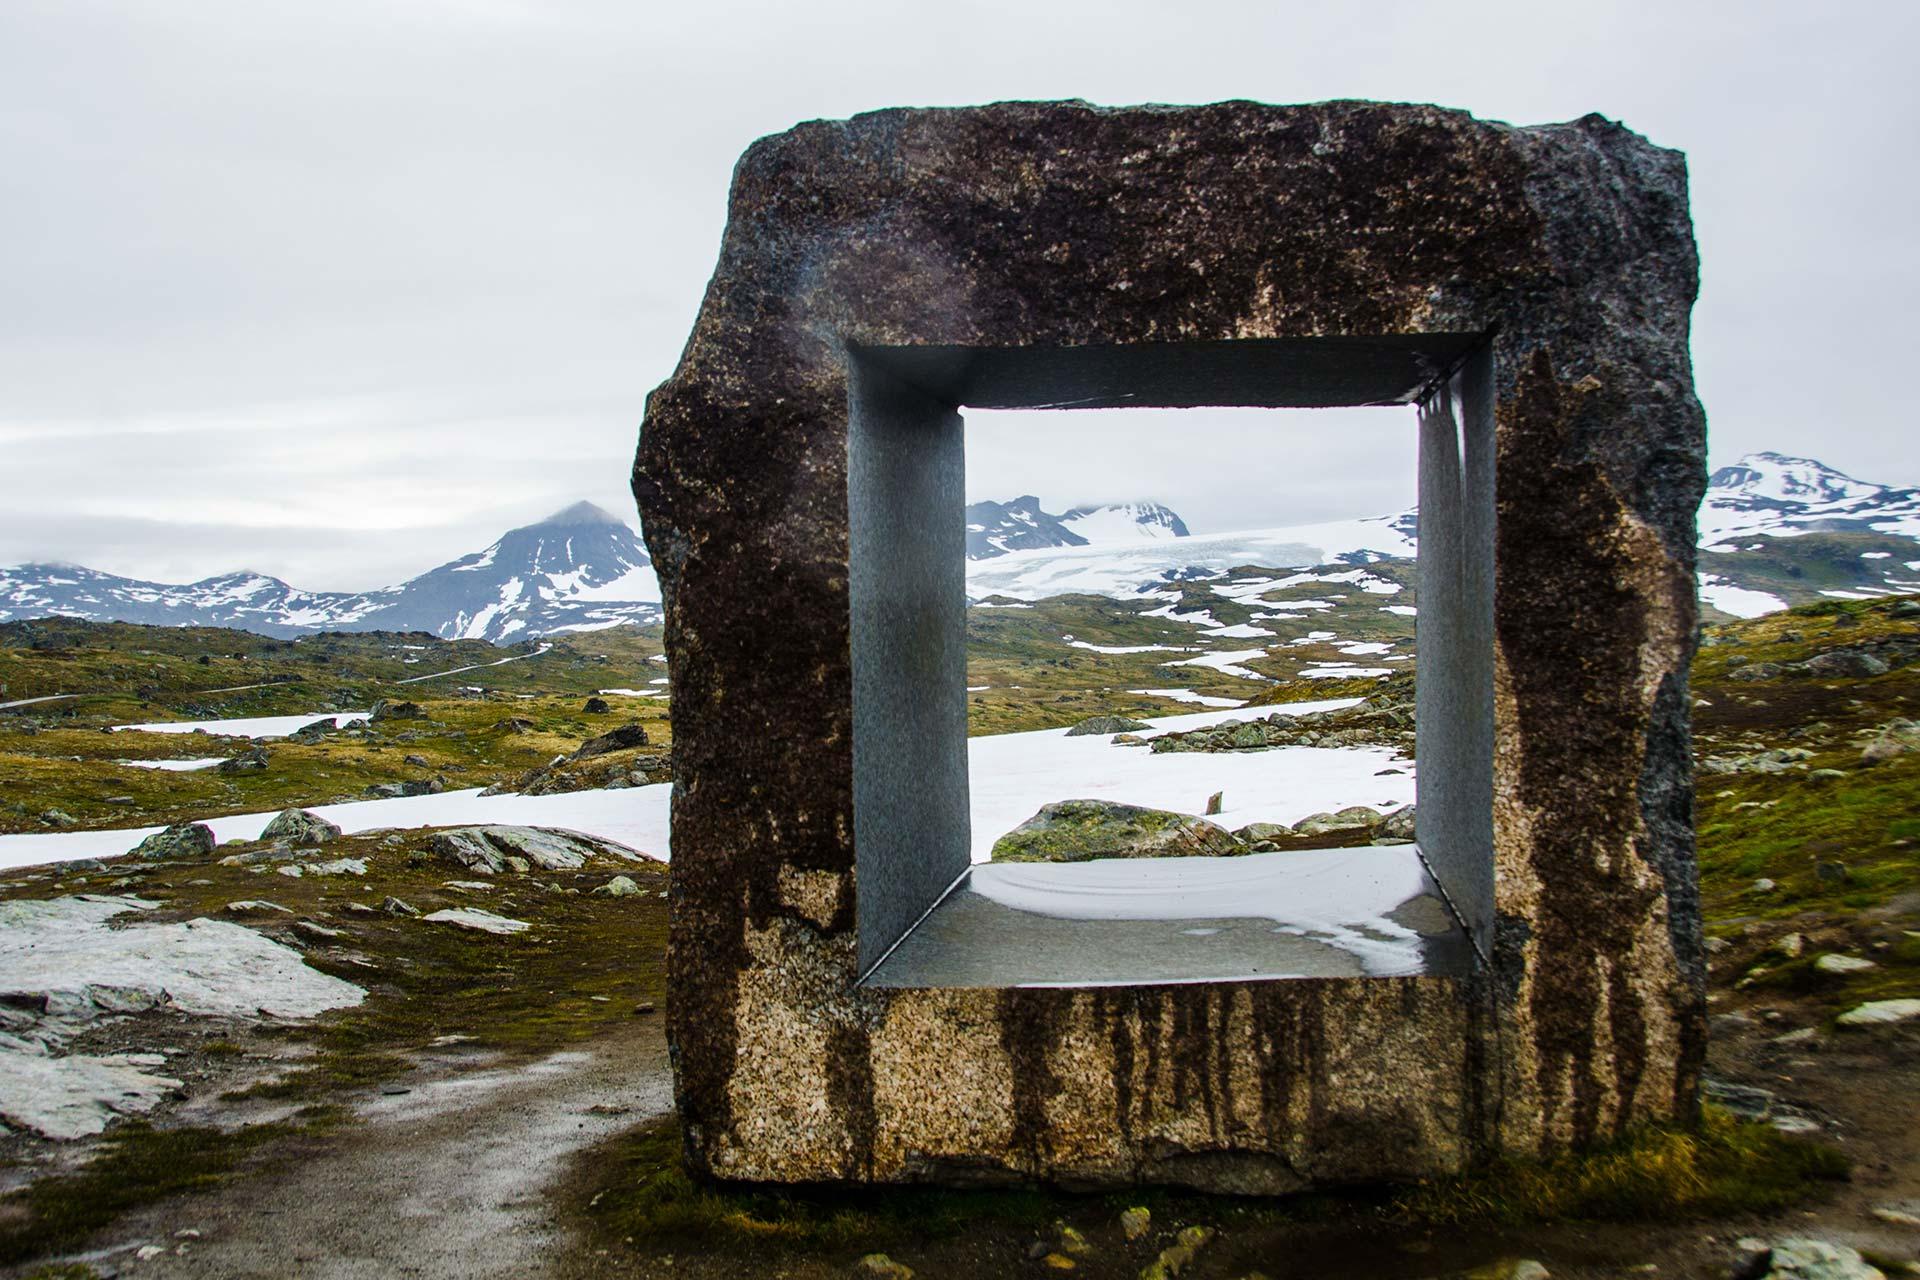 Skandinavien - Fjell im Hochland mit Figur